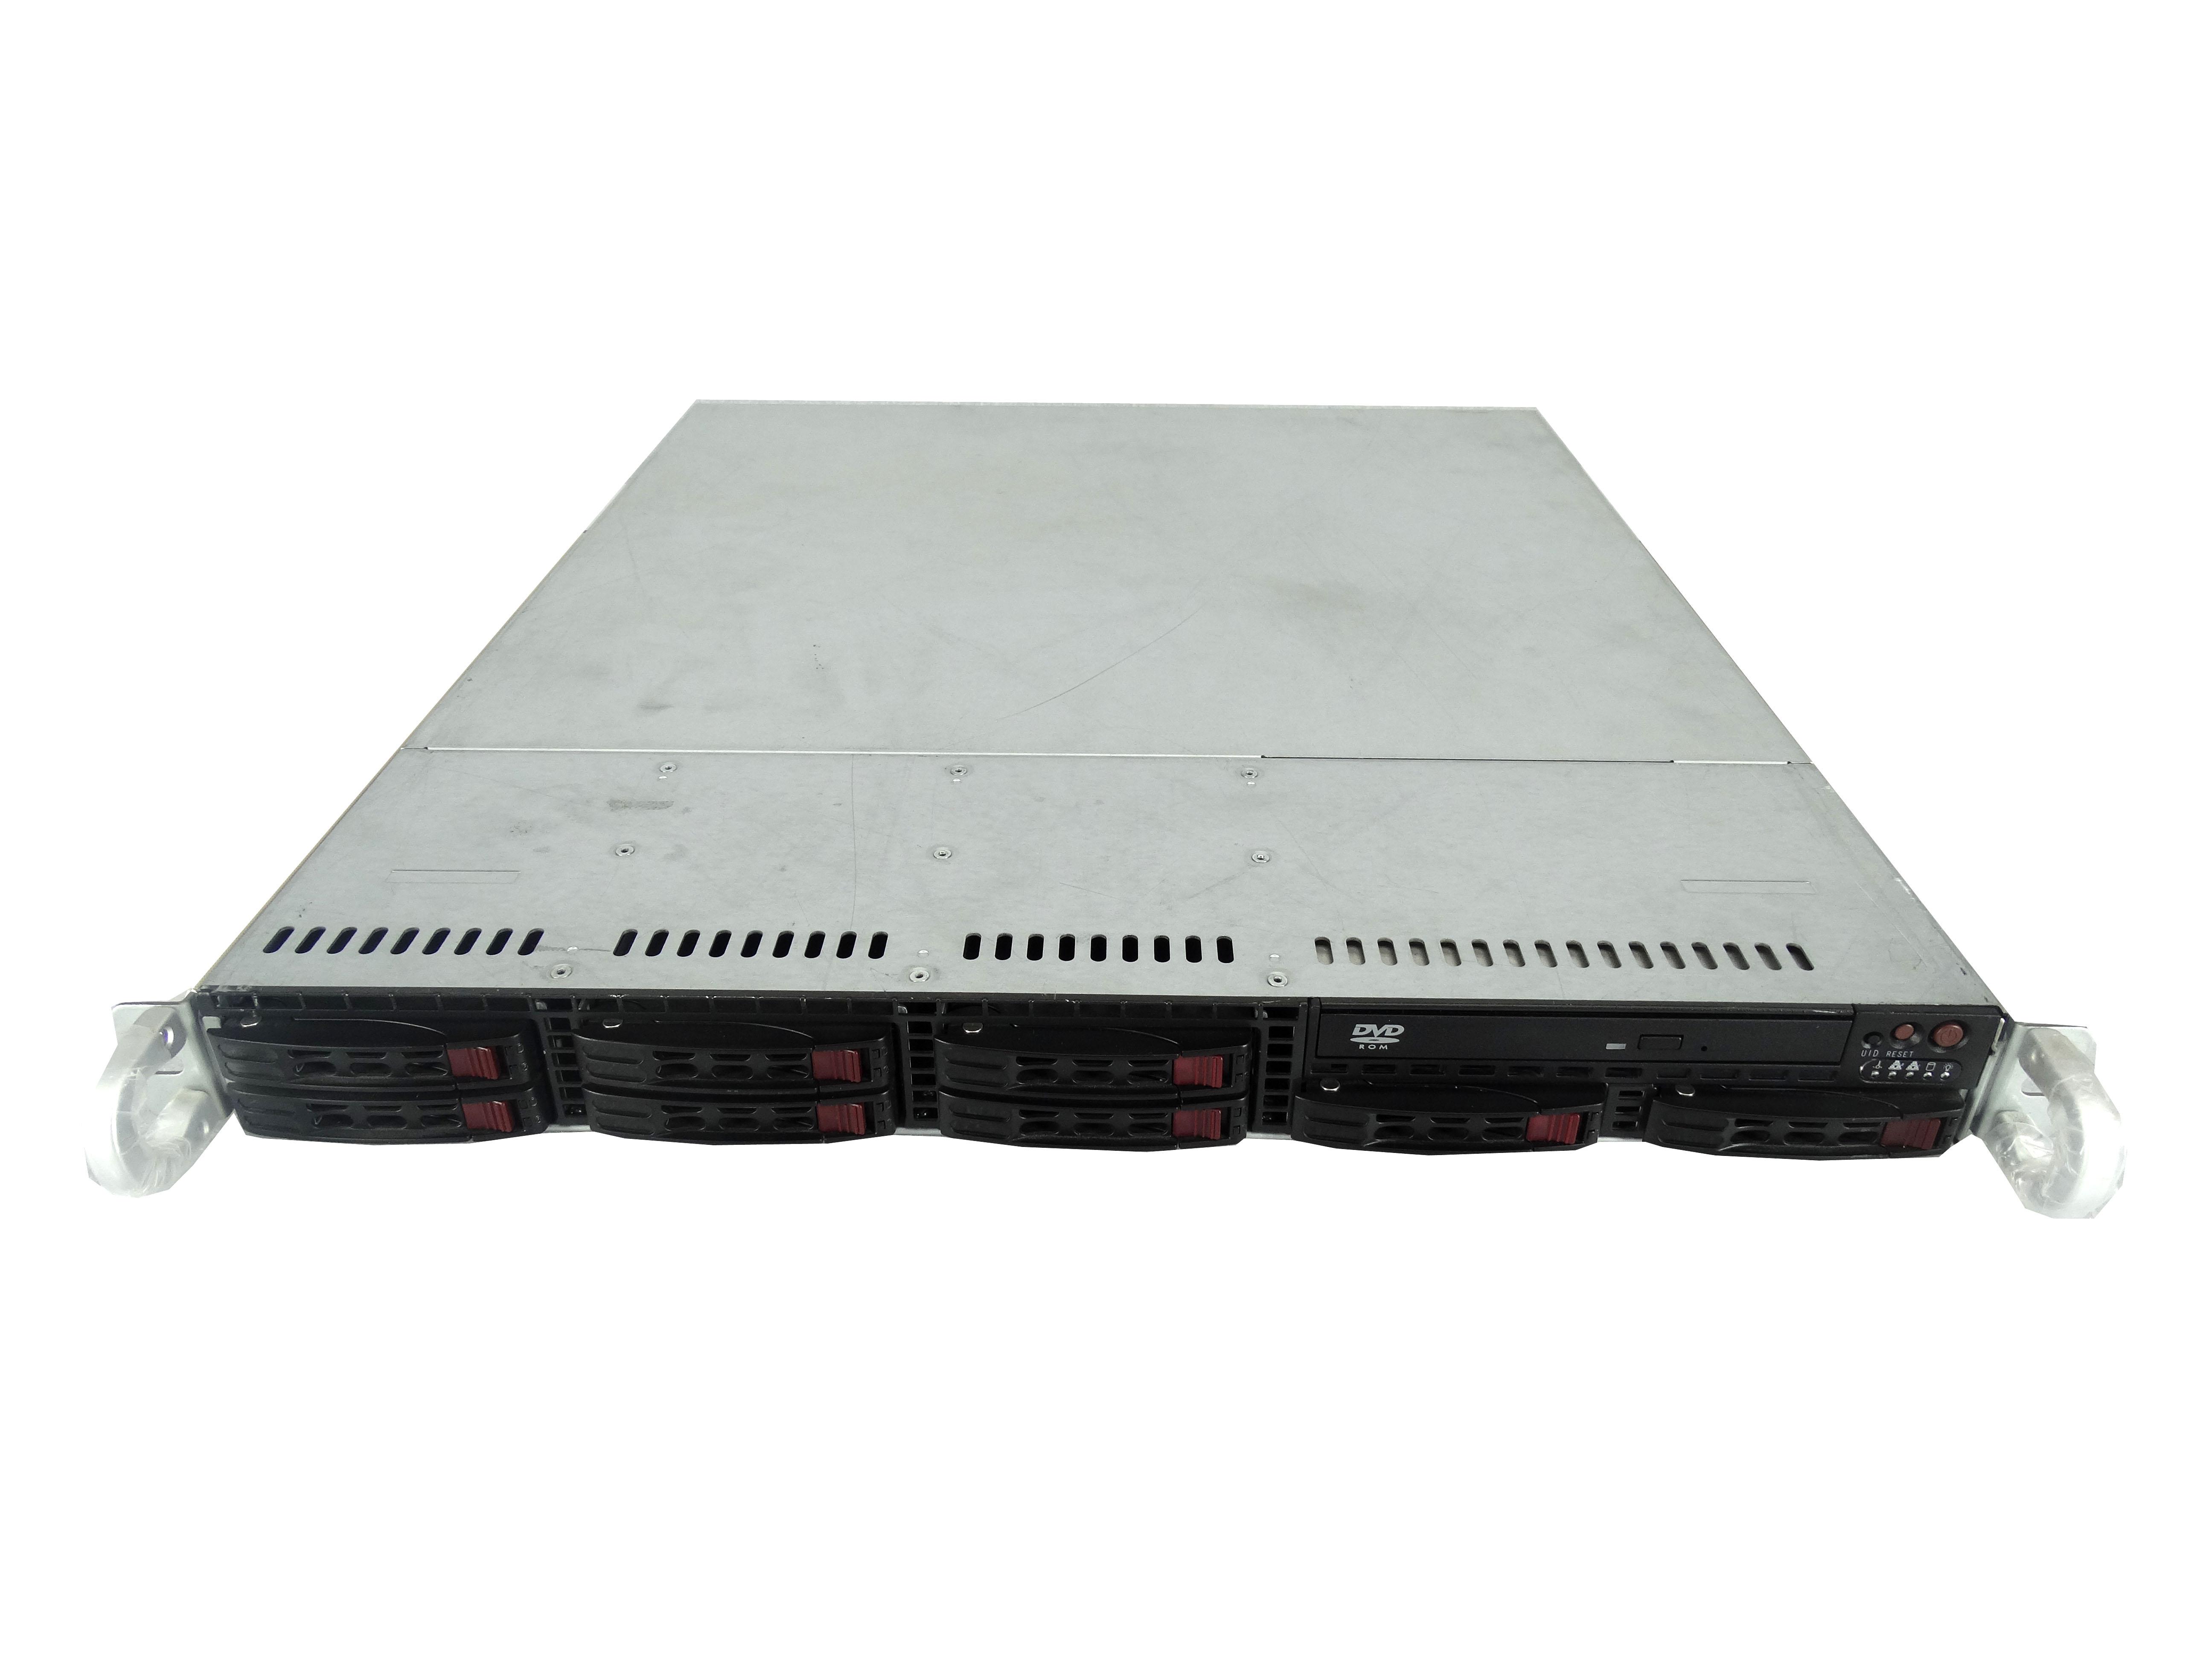 Supermicro SuperChassis CSE-113TQ 8-Bay SFF 1U Rackmount Server